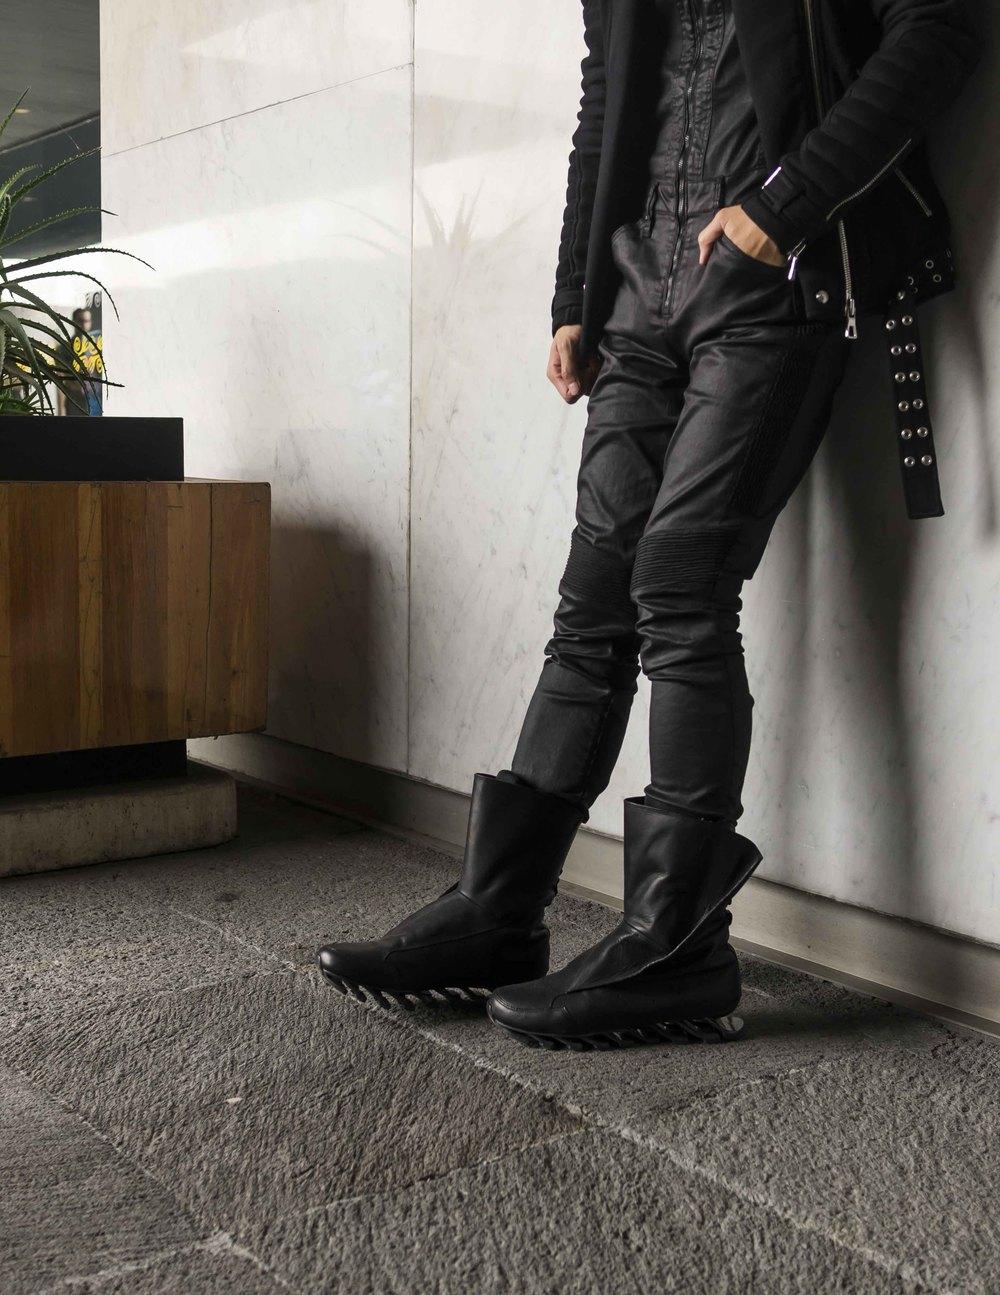 mybelonging-tommylei-menswear-streetstyle-luisa-via-roma-mexico-city-rick-owens-adidas_8.jpg